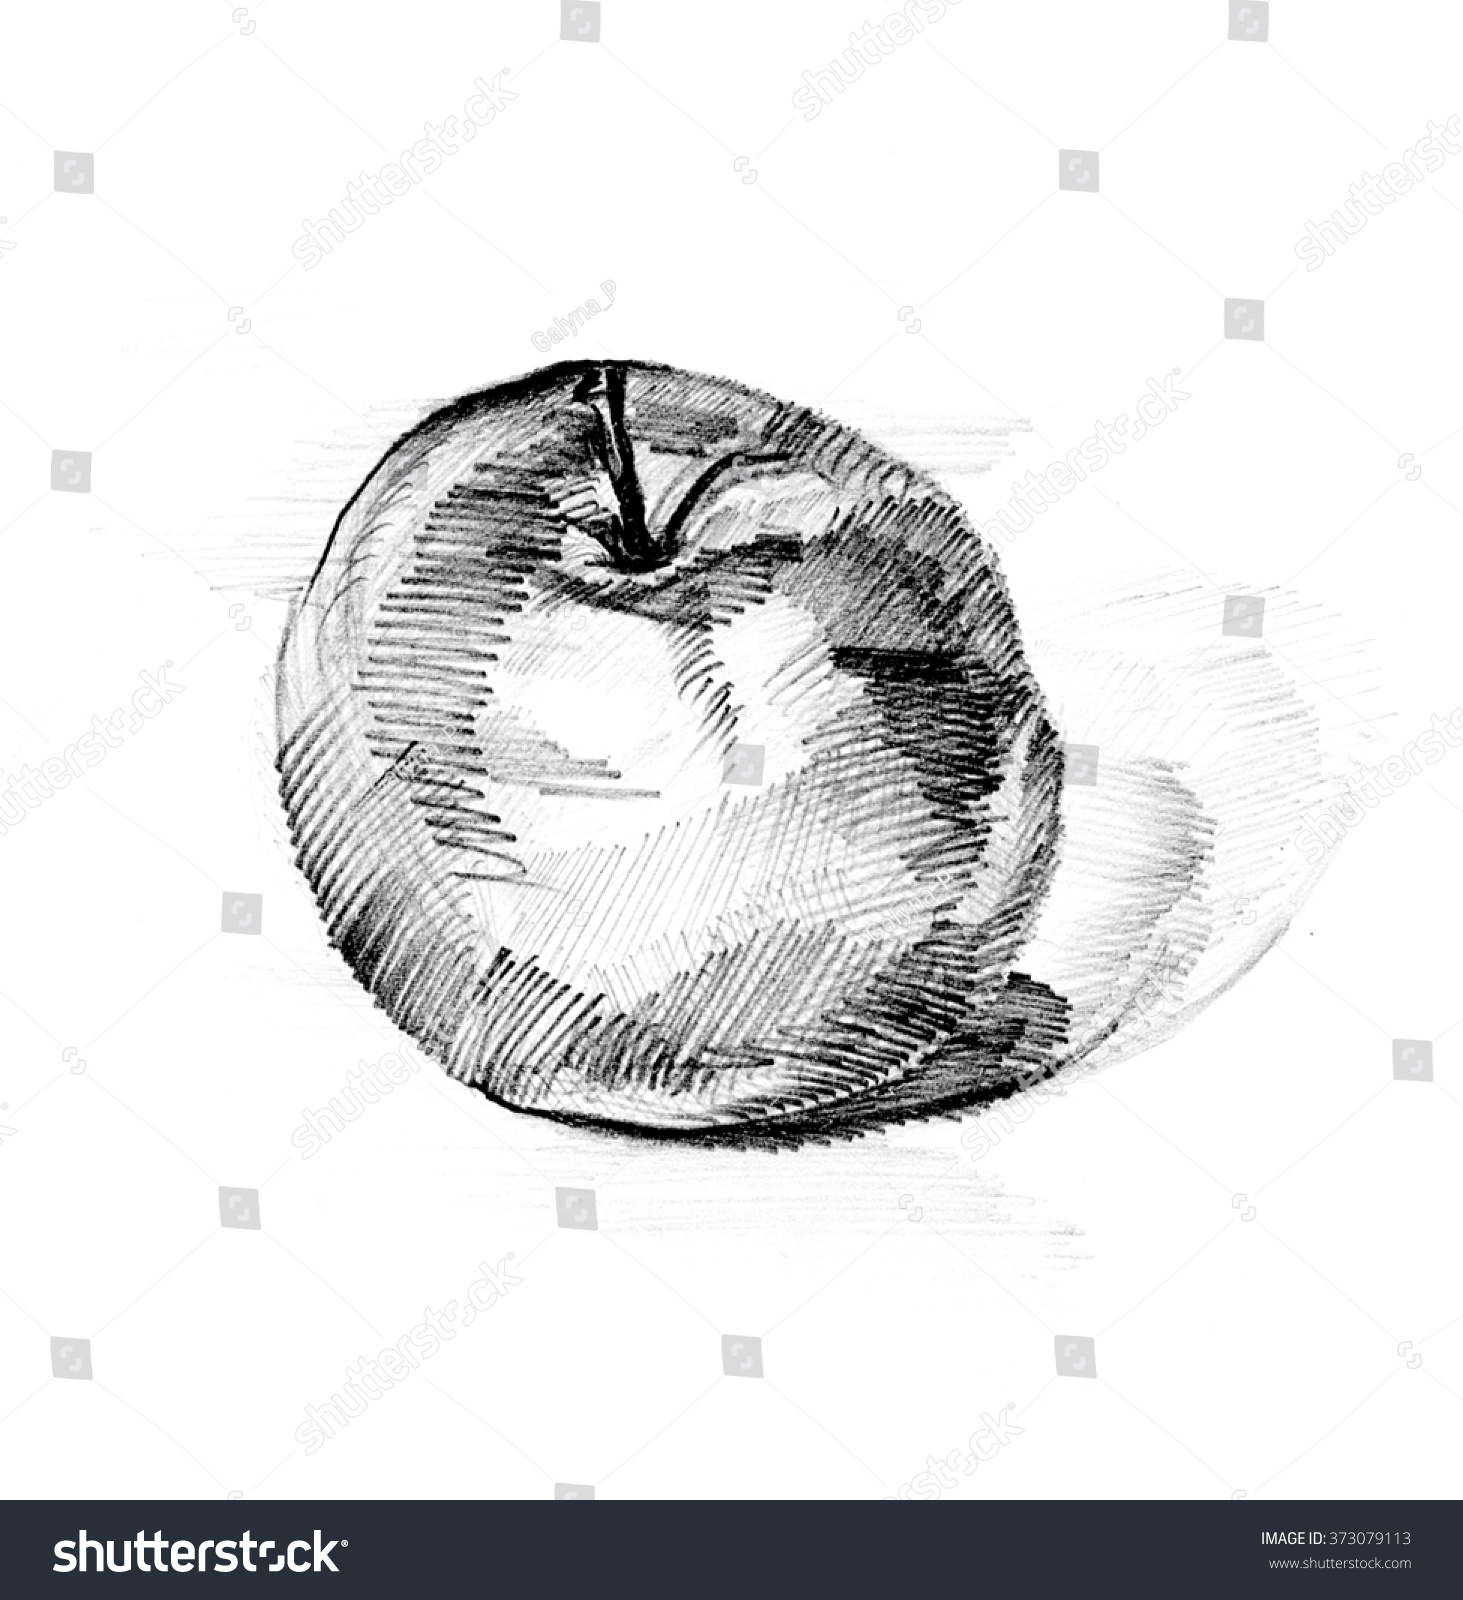 Handmade Apple Pencil Draw Pencil Line Stock Illustration 373079113